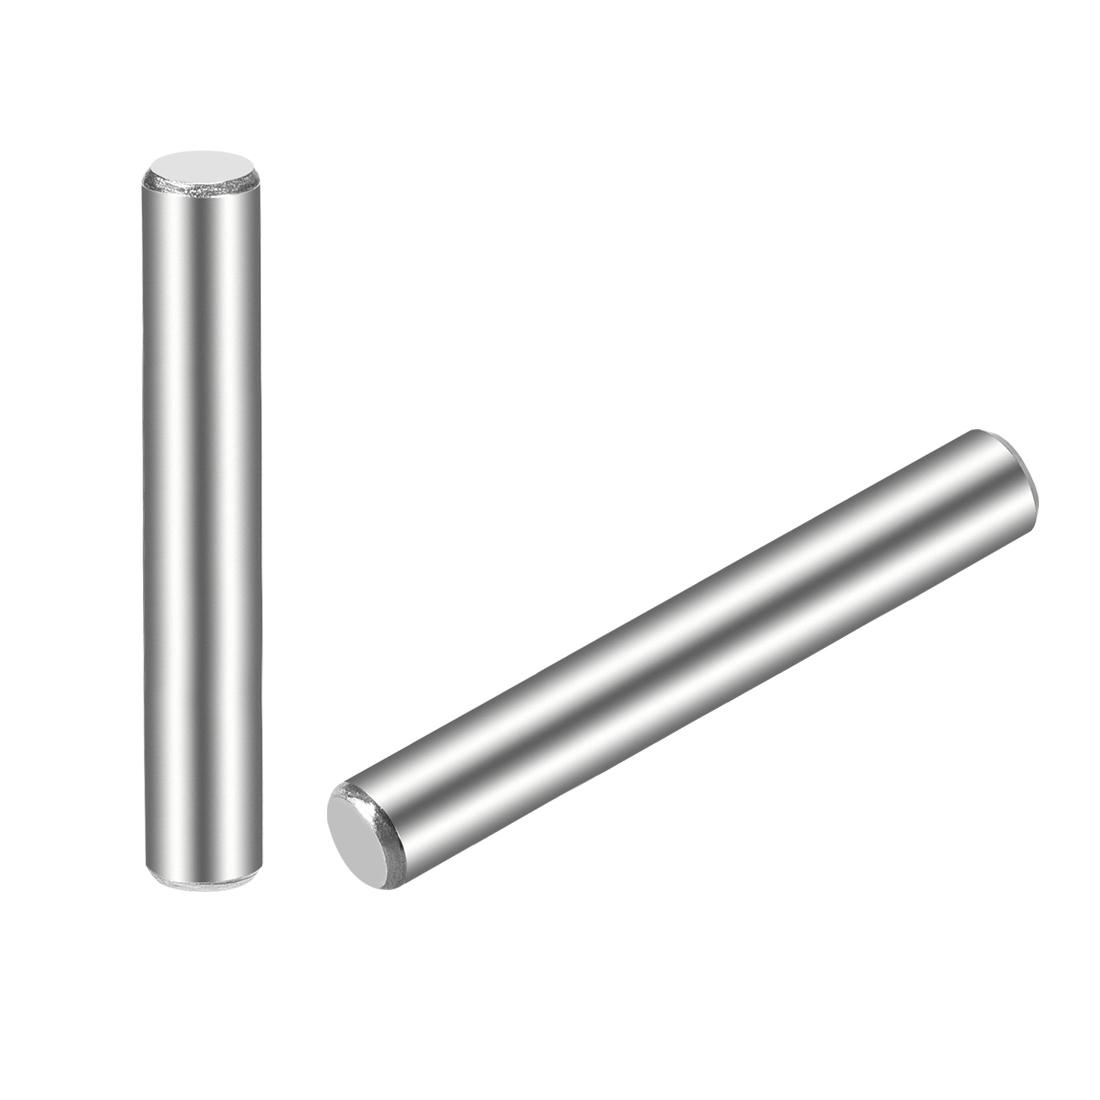 15Pcs 5mm x 45mm Dowel Pin 304 Stainless Steel Shelf Support Pin Fasten